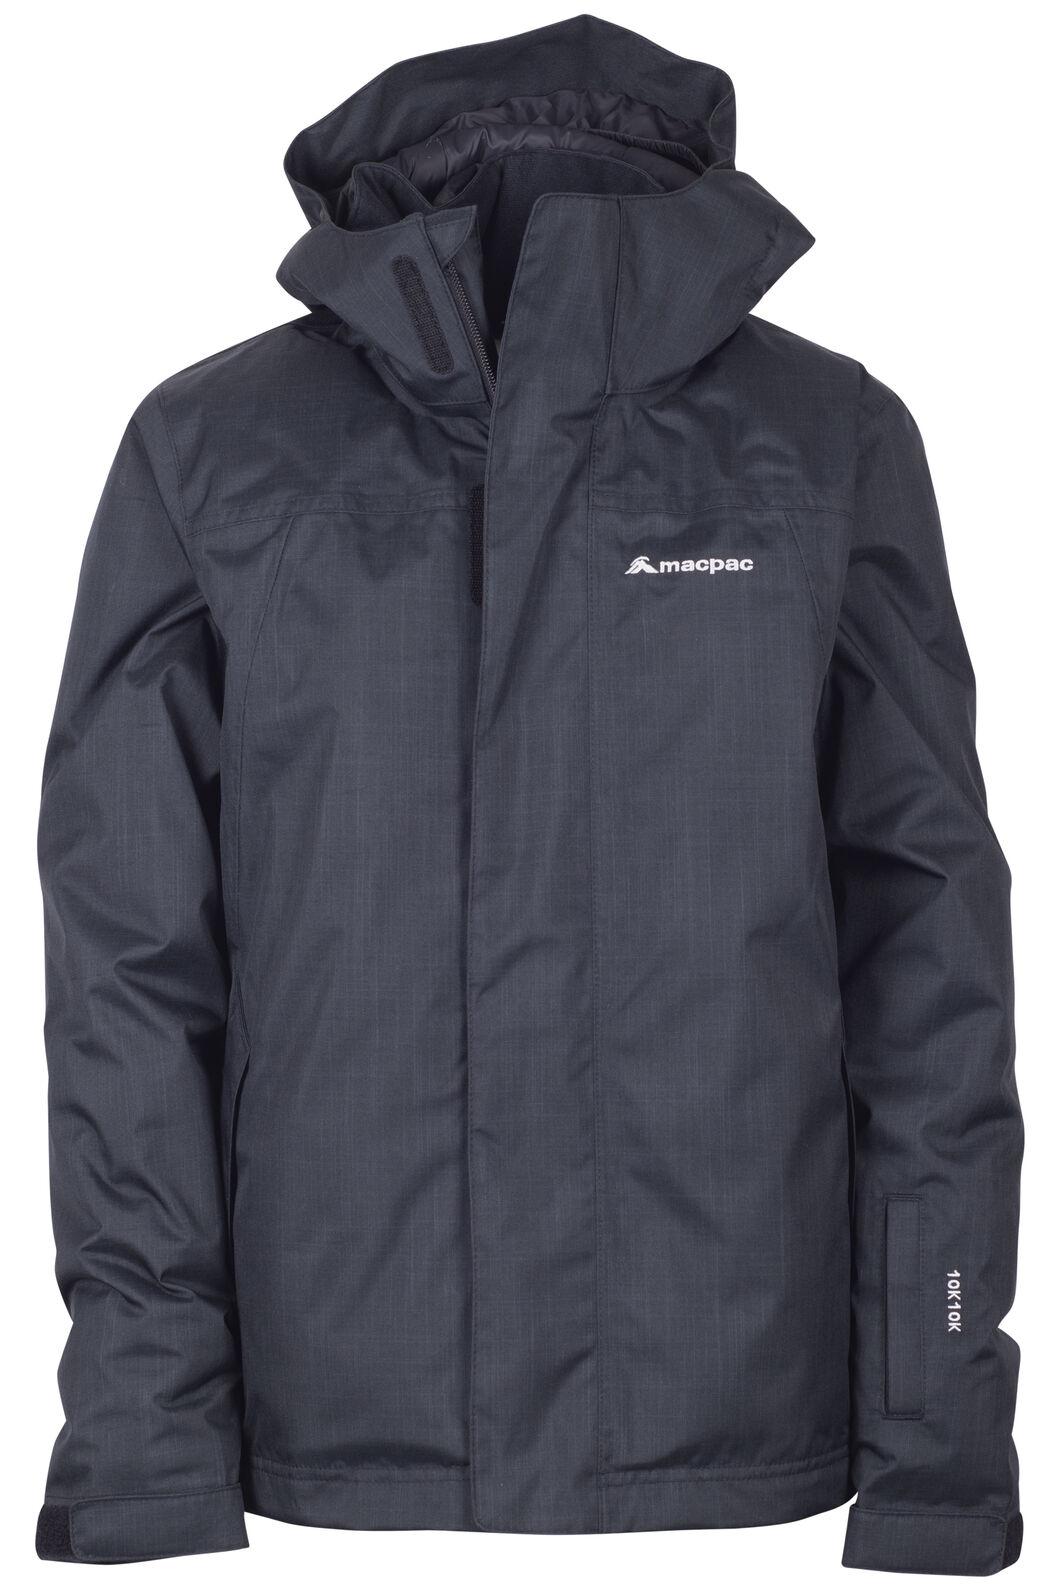 Macpac Spree Reflex™ Ski Jacket — Kids', Black, hi-res